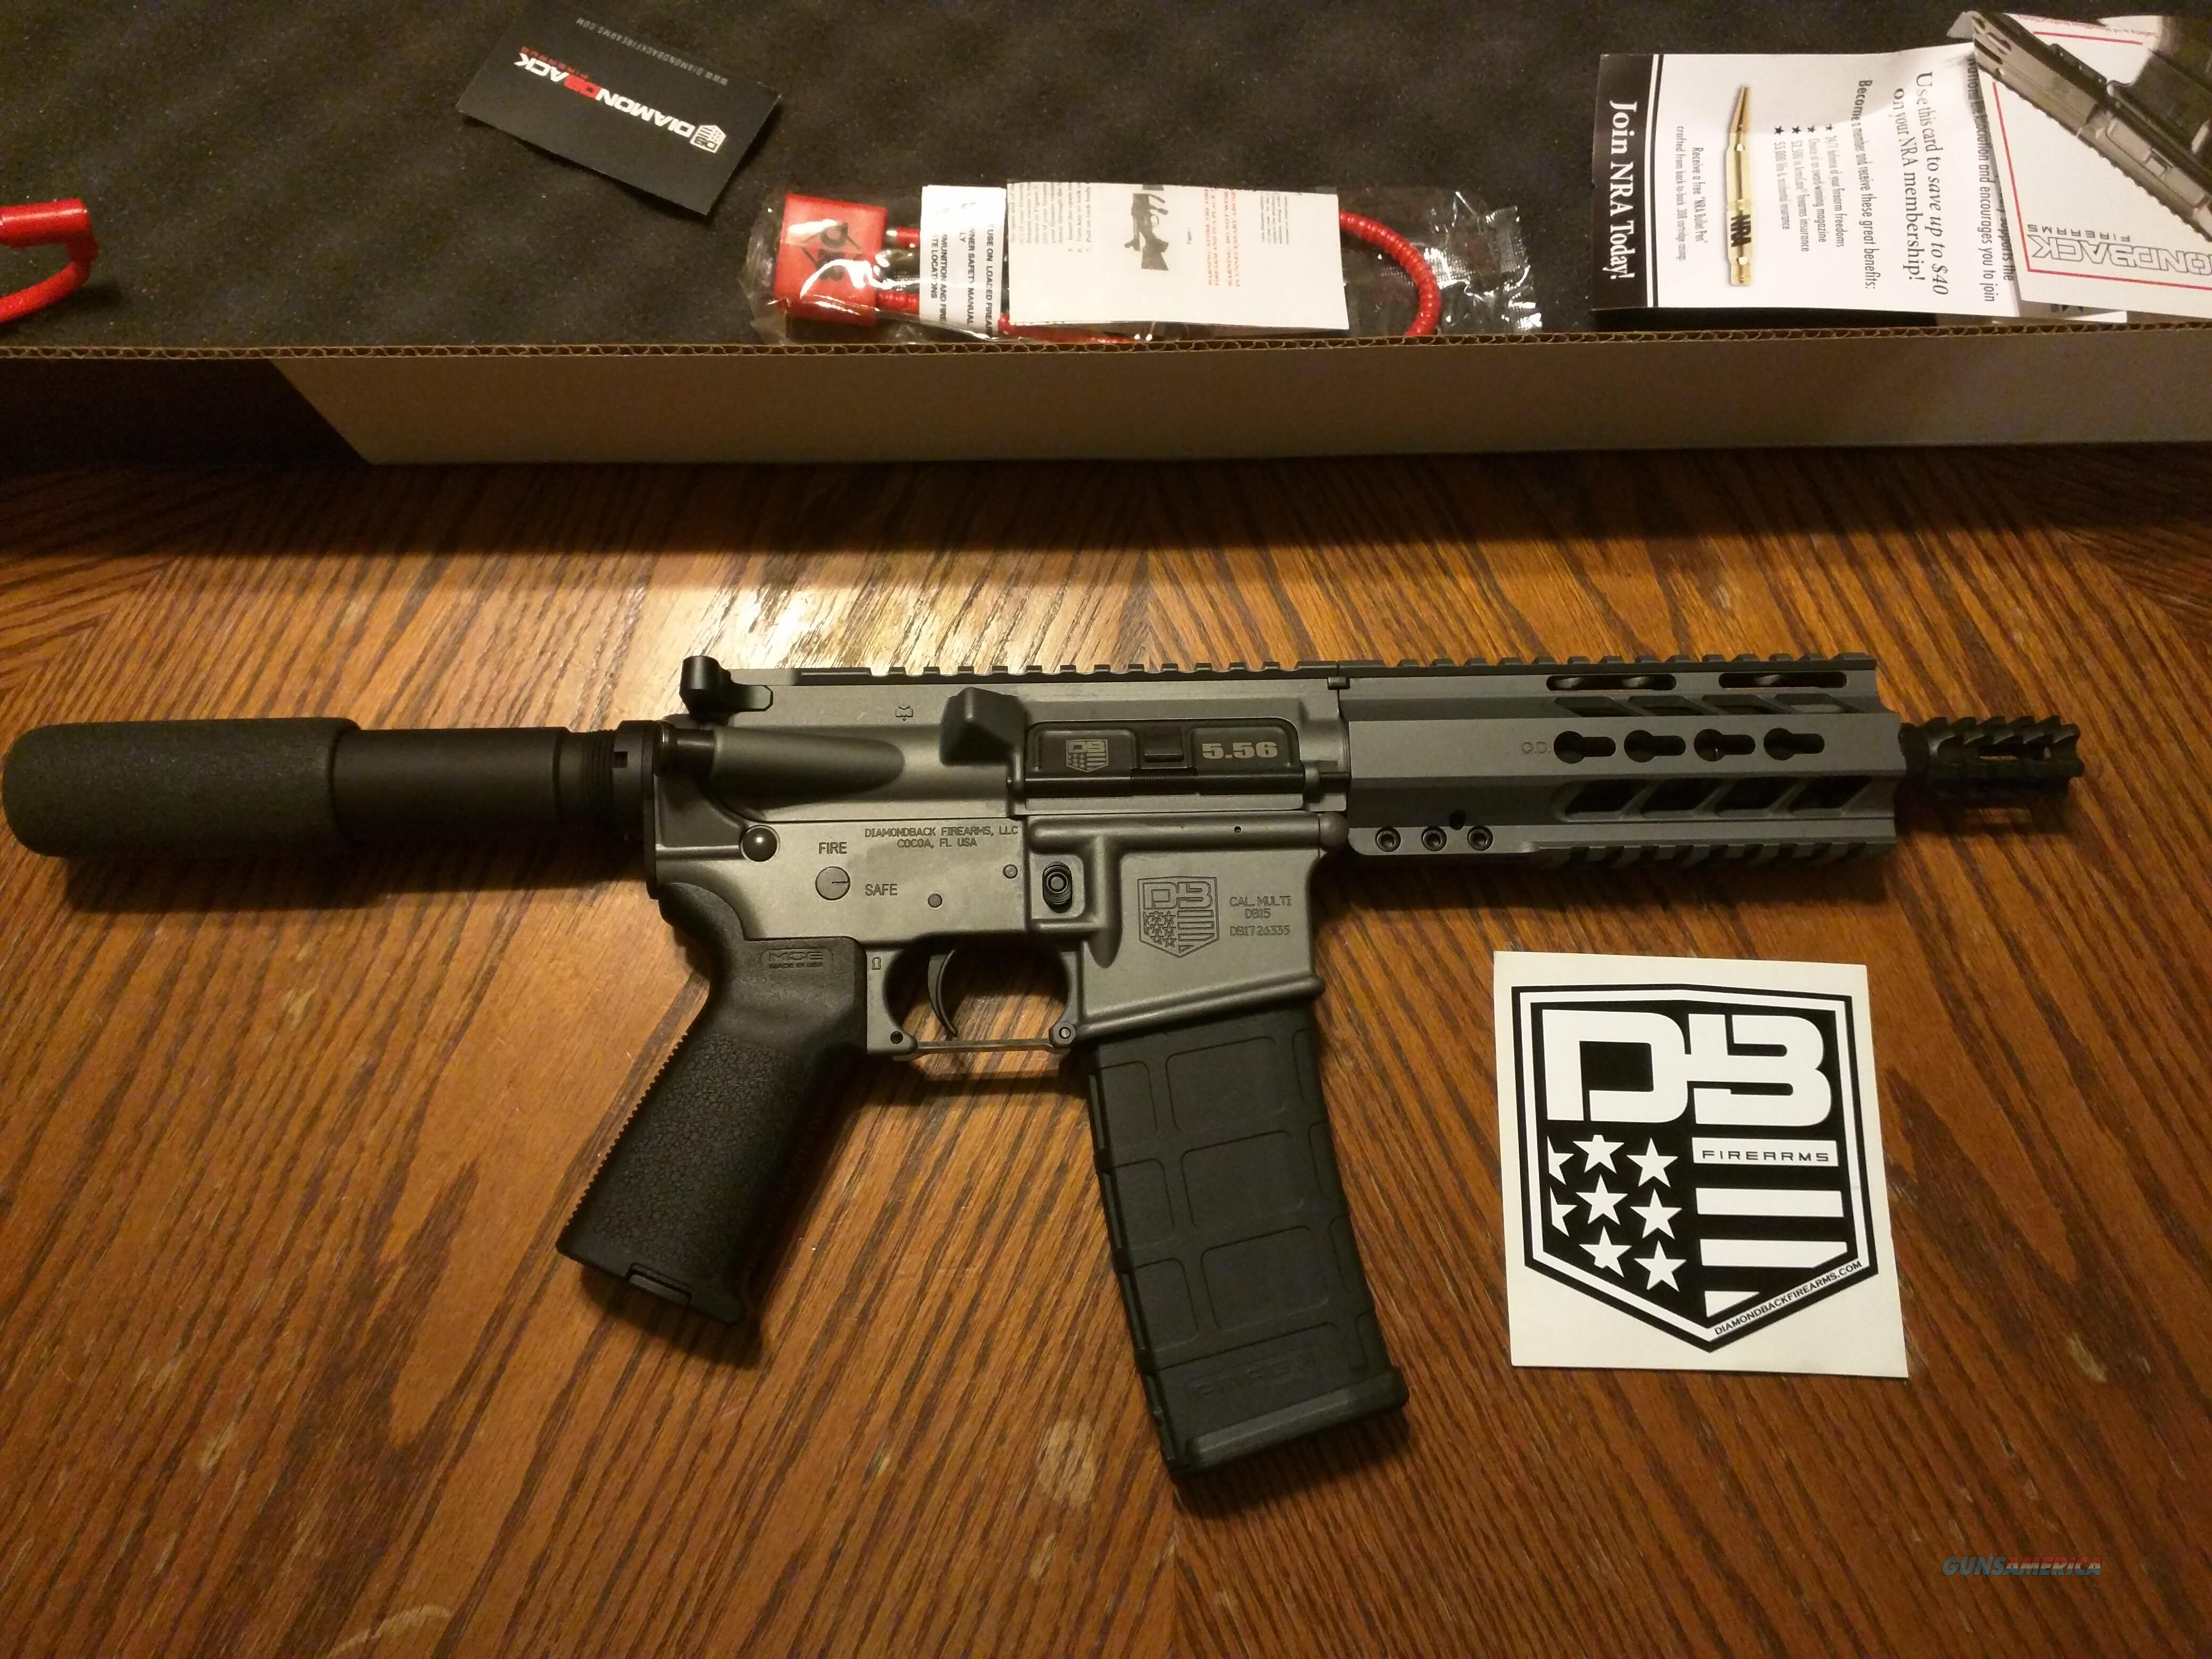 "Diamondback AR15 AR 15 DB 15 Pistol 5.56/223 NIB 7.5"" TACTICAL GRAY 30 Rd Muzzle Brake FREE LAYAWAY  Guns > Rifles > AR-15 Rifles - Small Manufacturers > Complete Rifle"